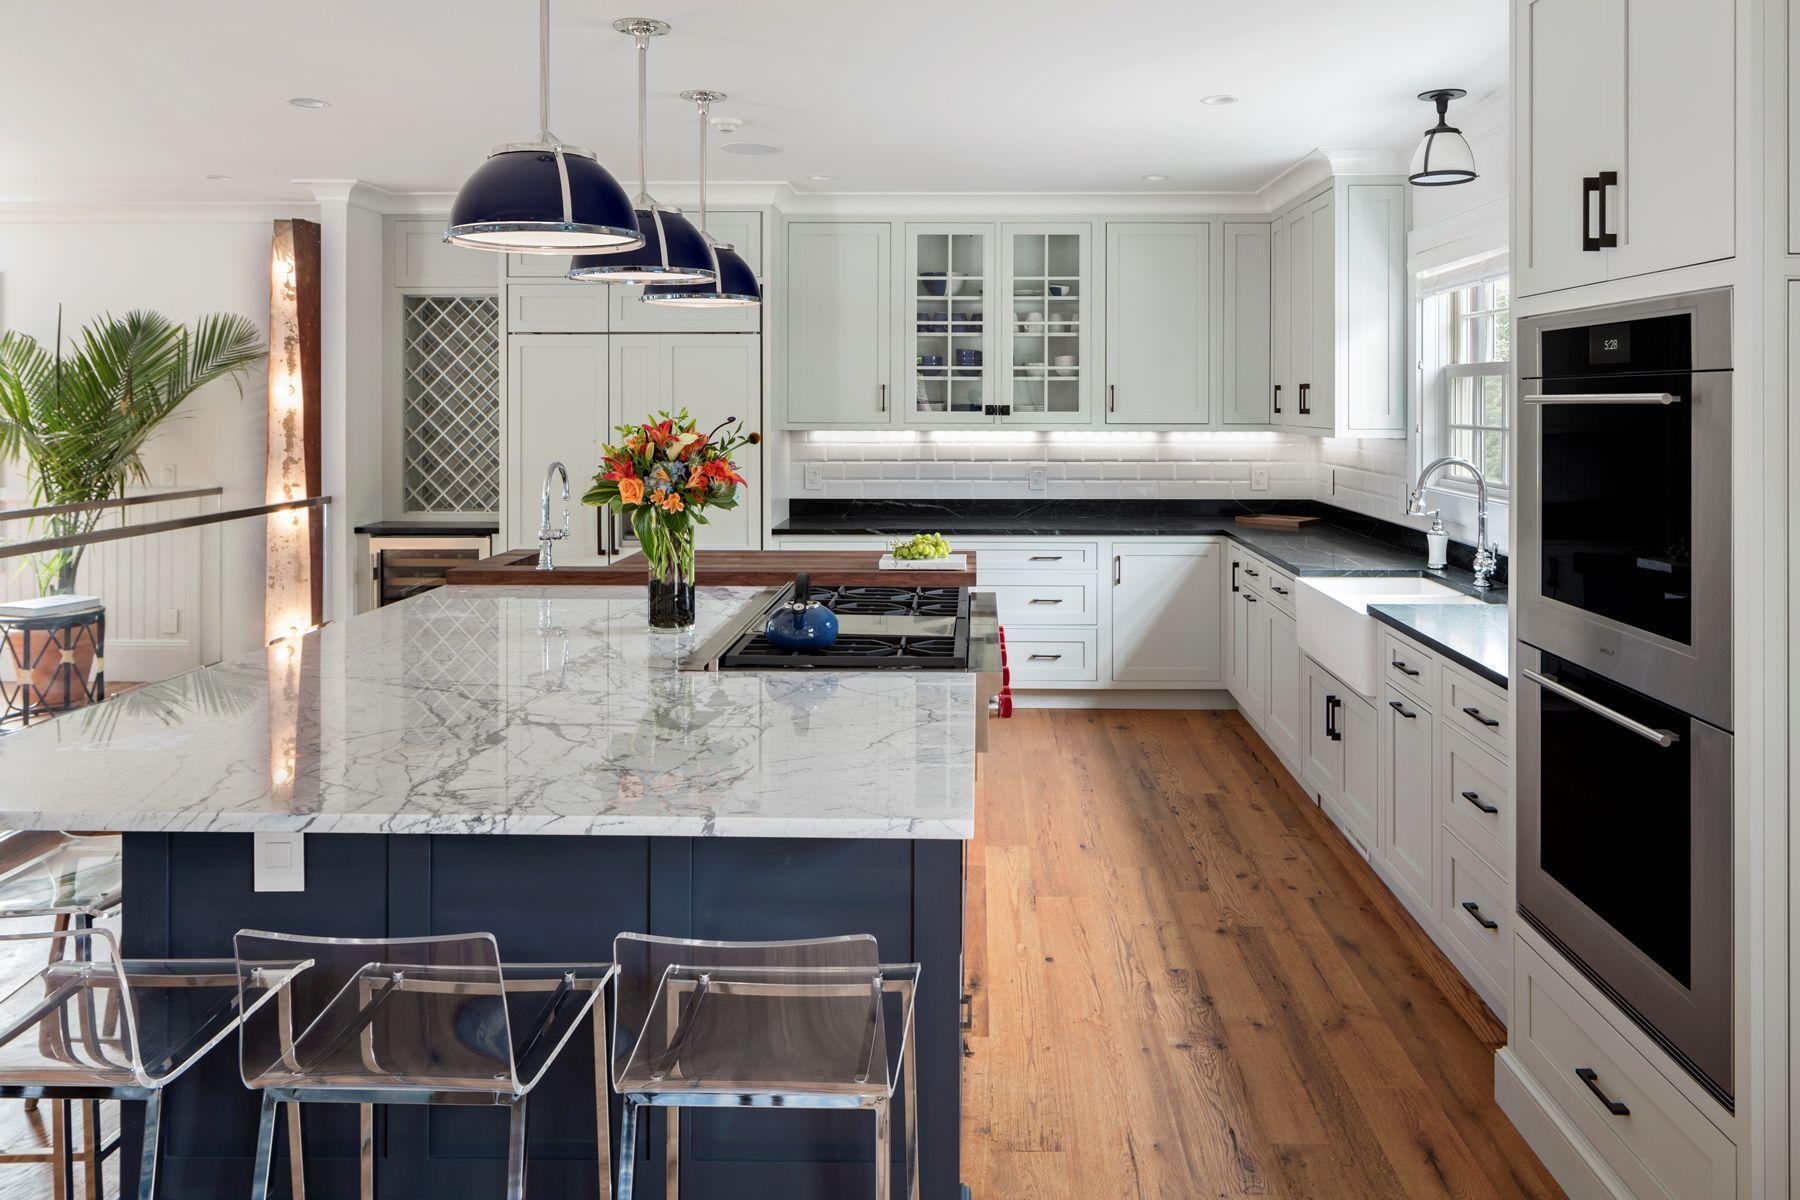 kitchens classic kitchen interiors classic kitchens kitchen interior kitchen on kitchen interior classic id=24369